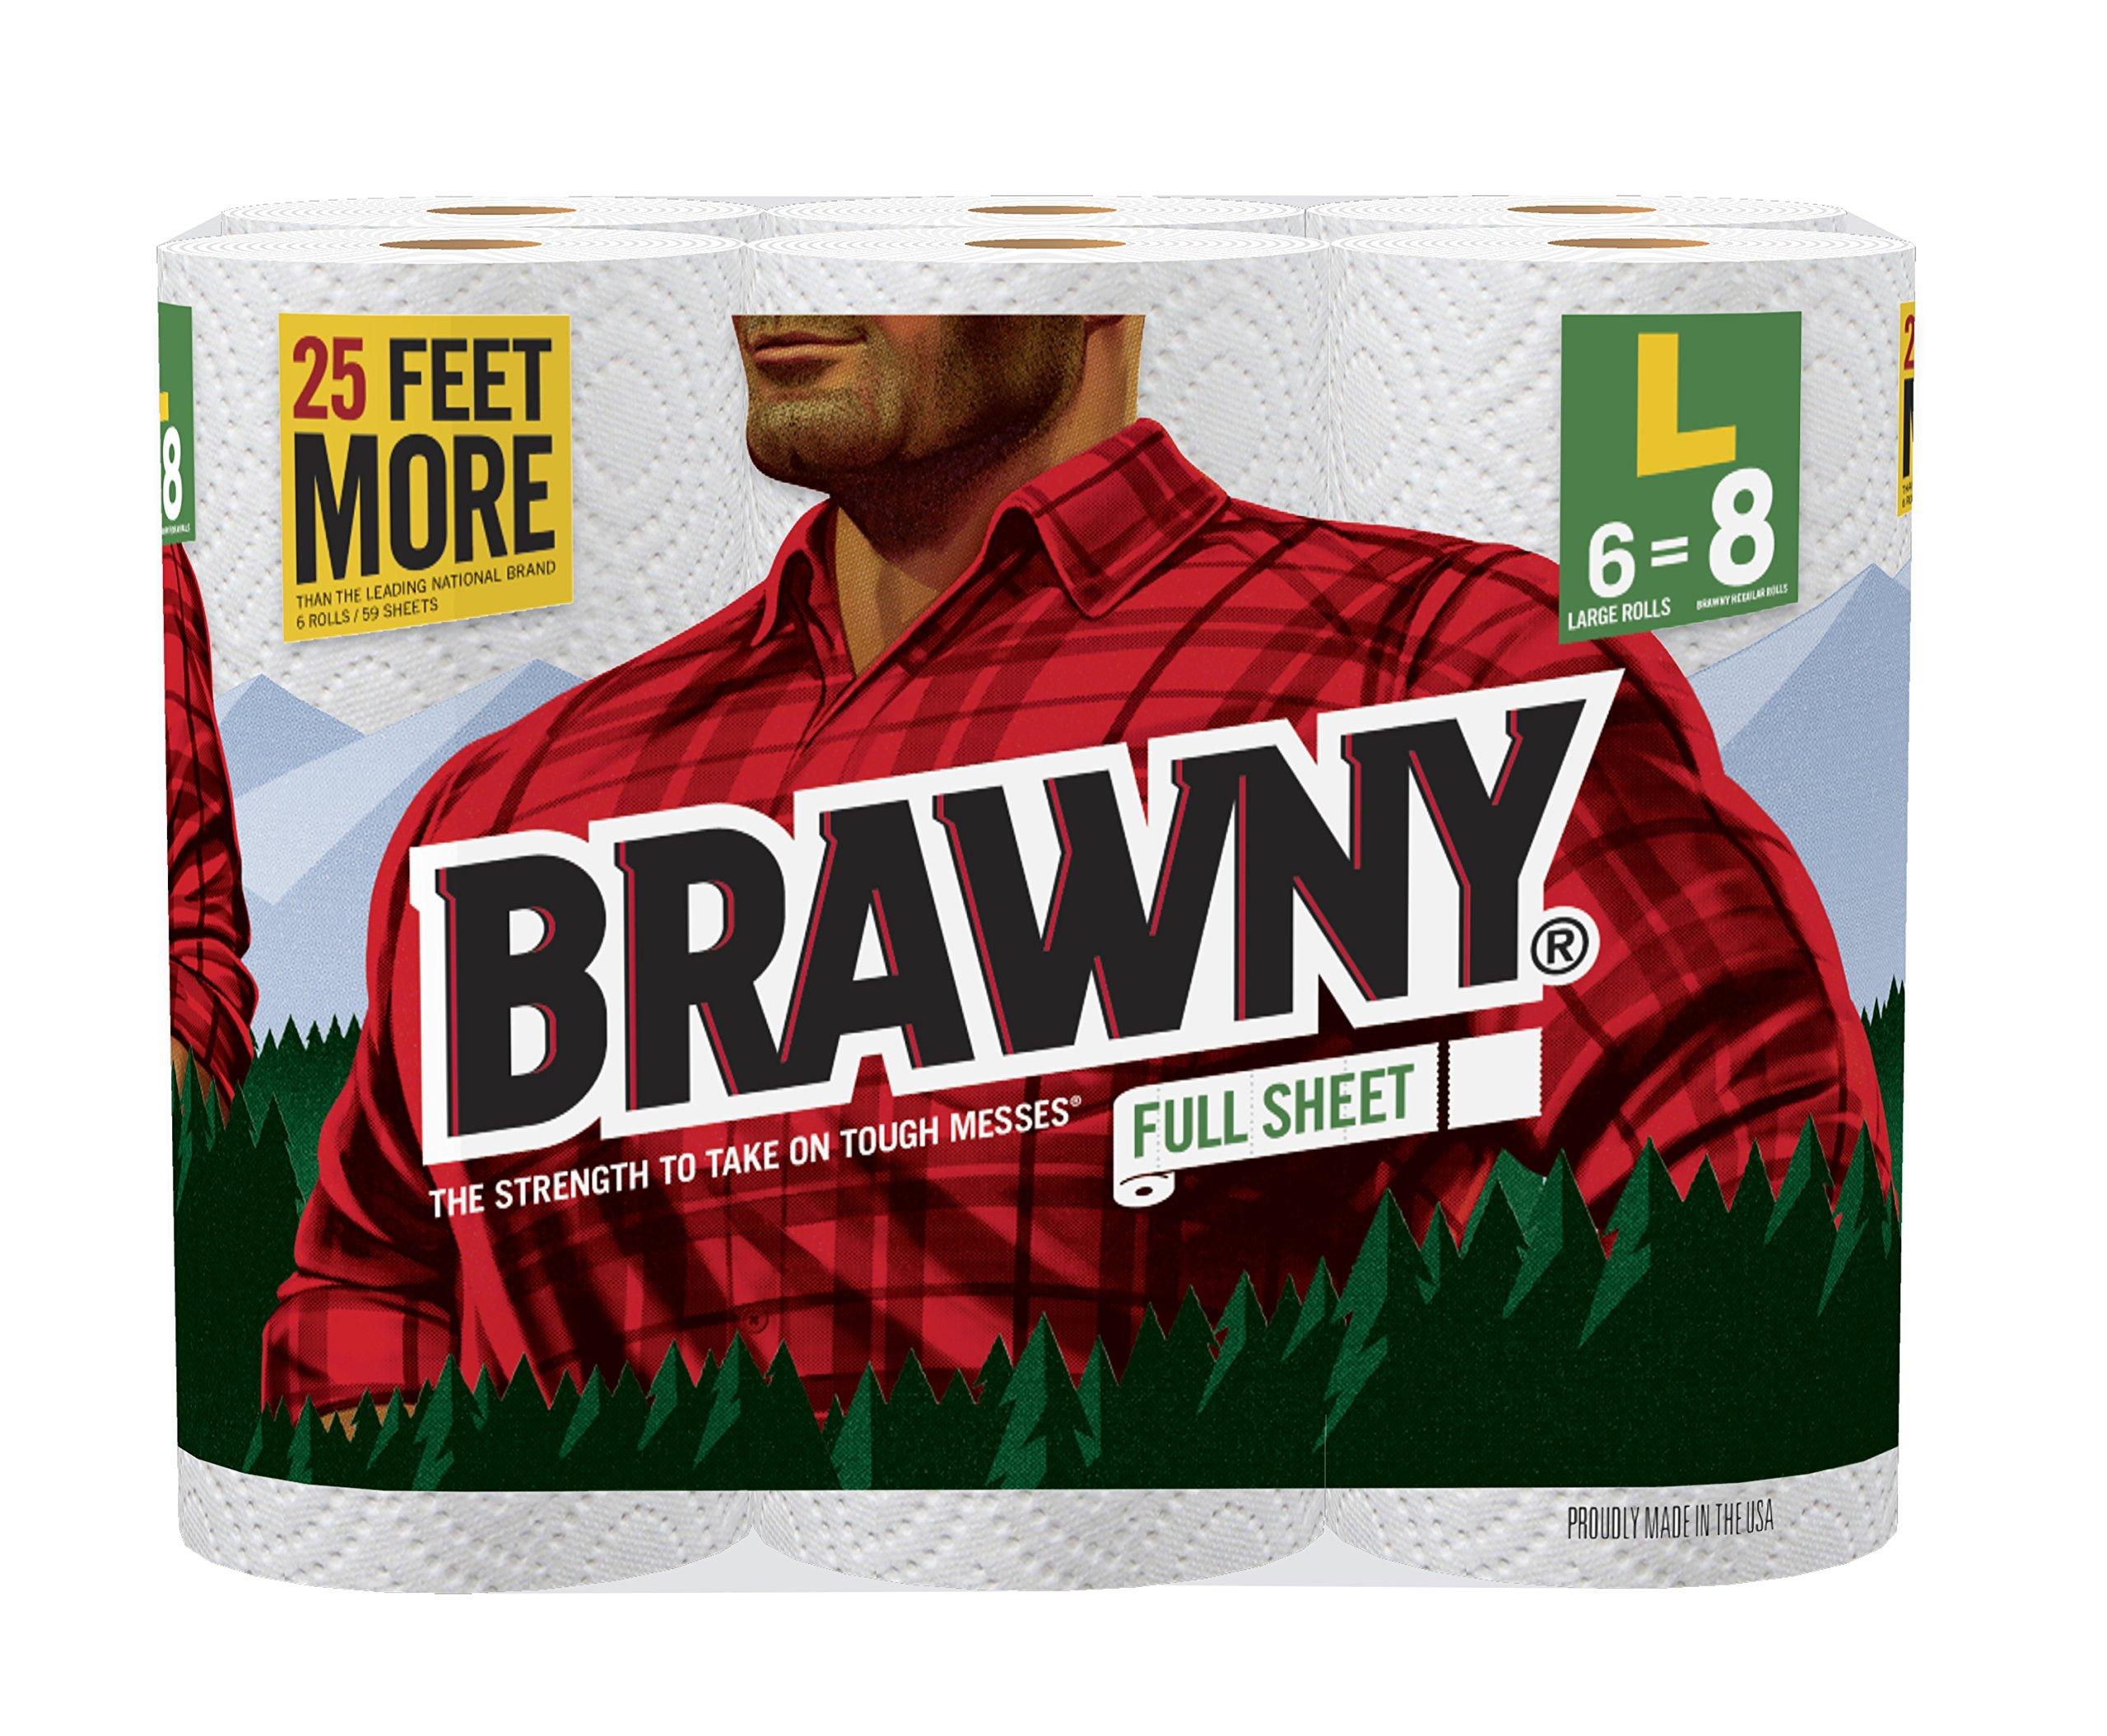 Brawny Paper Towels, 6 Large Rolls, Full Sheet, 6 = 8 Regular Rolls